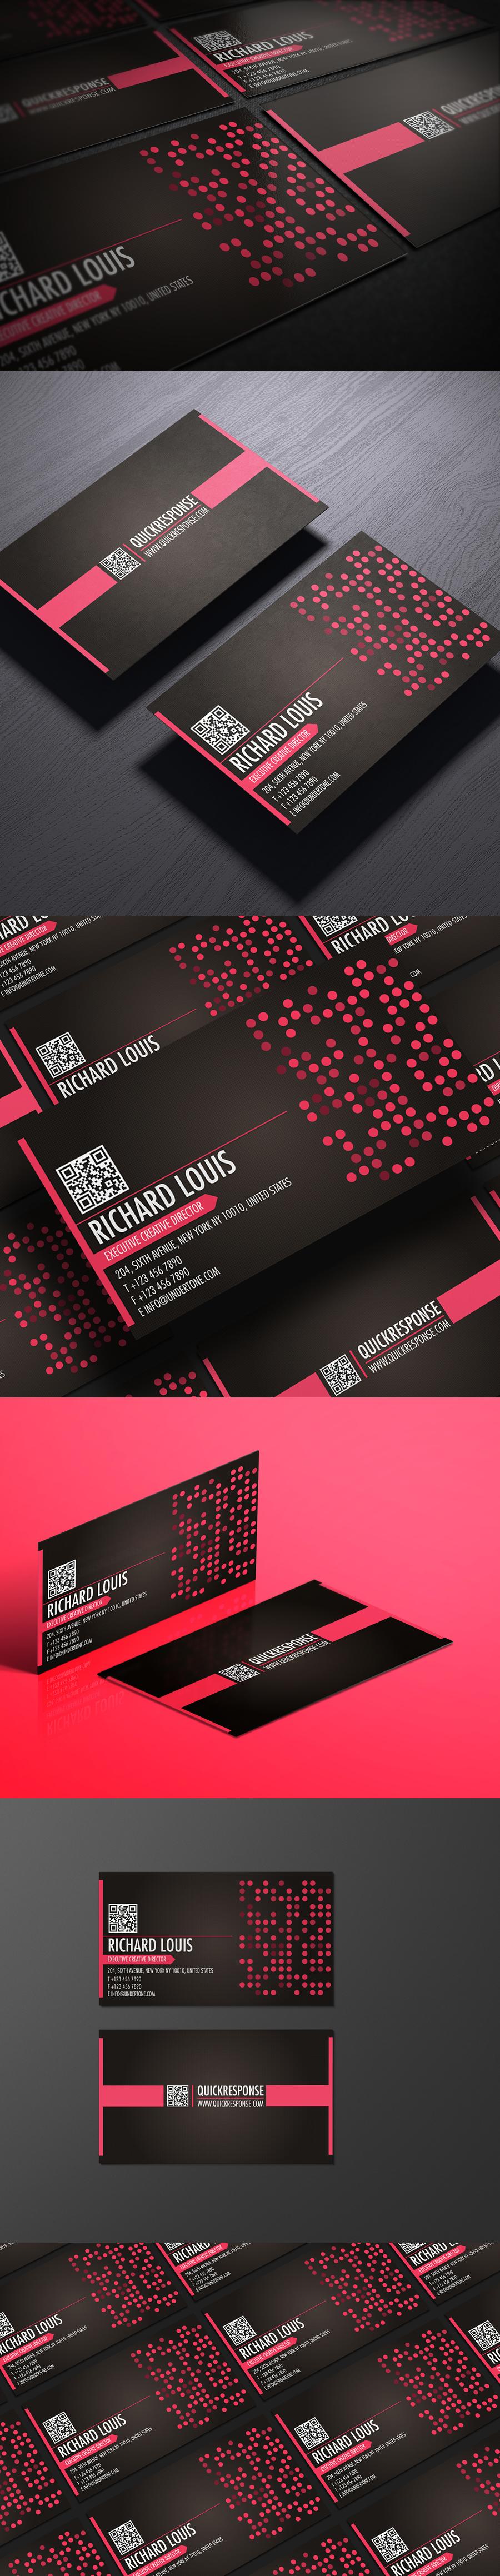 Hot pink business card design by Lemongraphic on DeviantArt